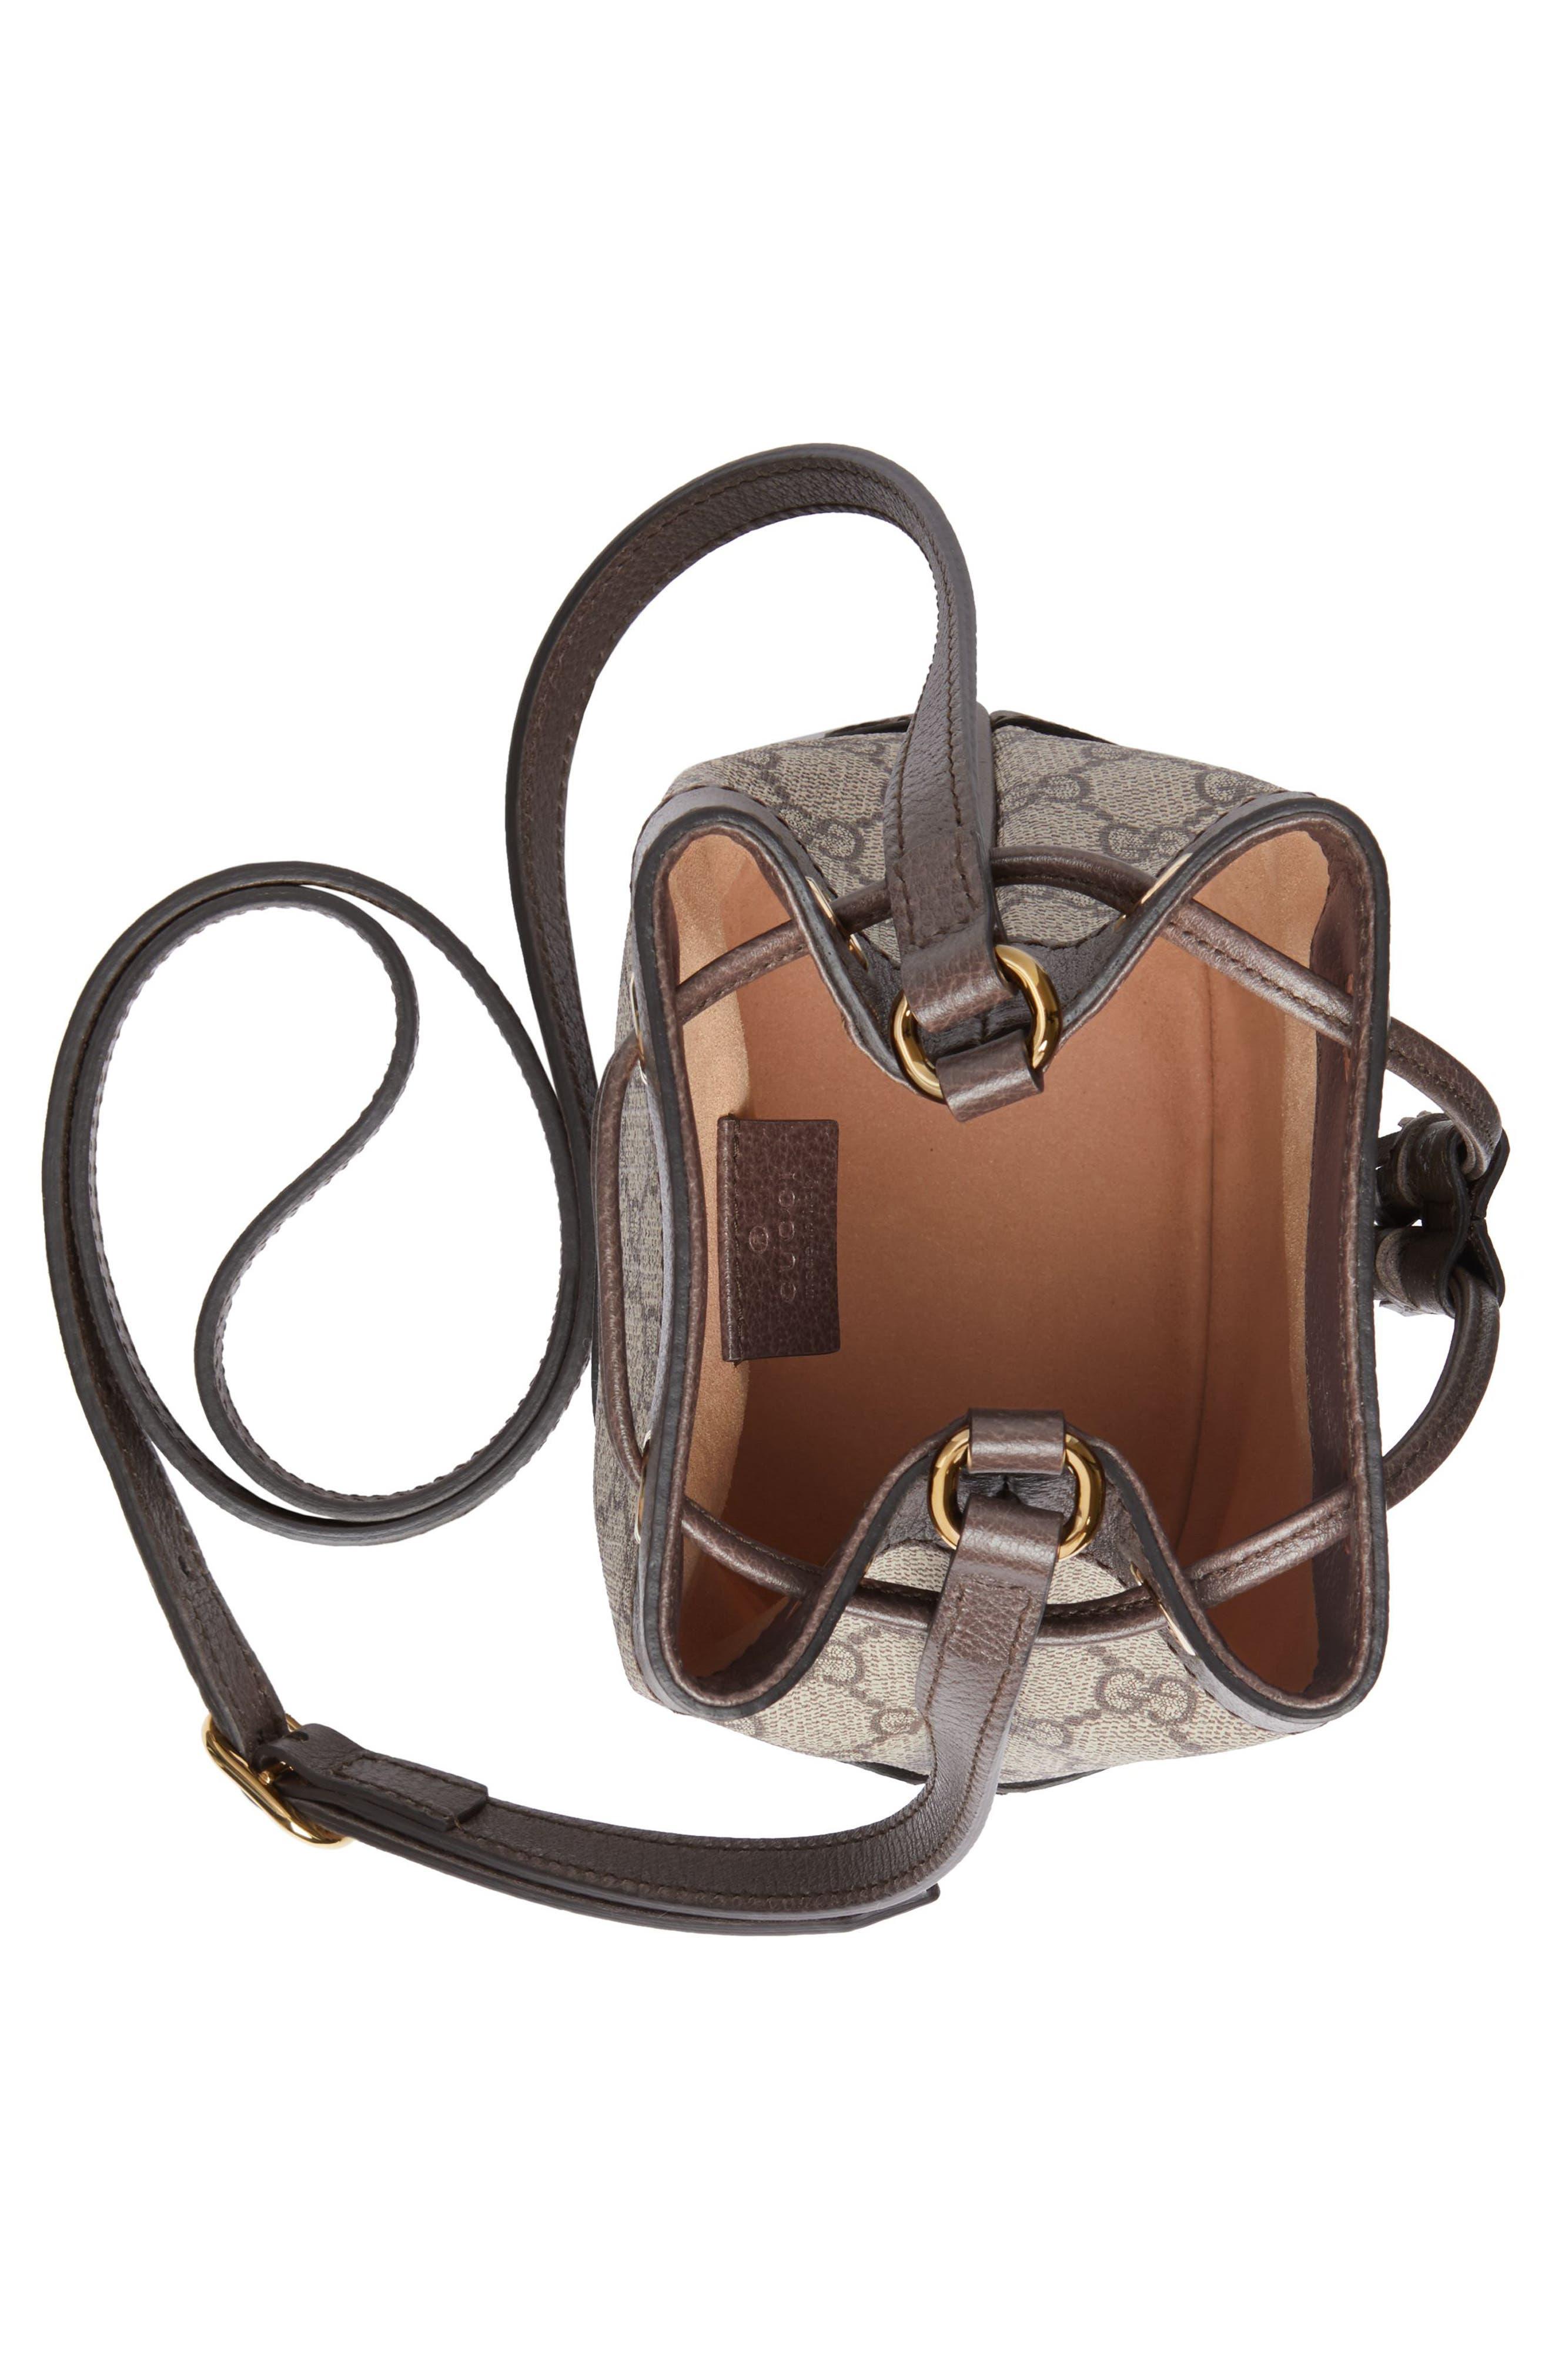 Mini Ophidia GG Supreme Bucket Bag,                             Alternate thumbnail 3, color,                             BEIGE EBONY/ NEW ACERO